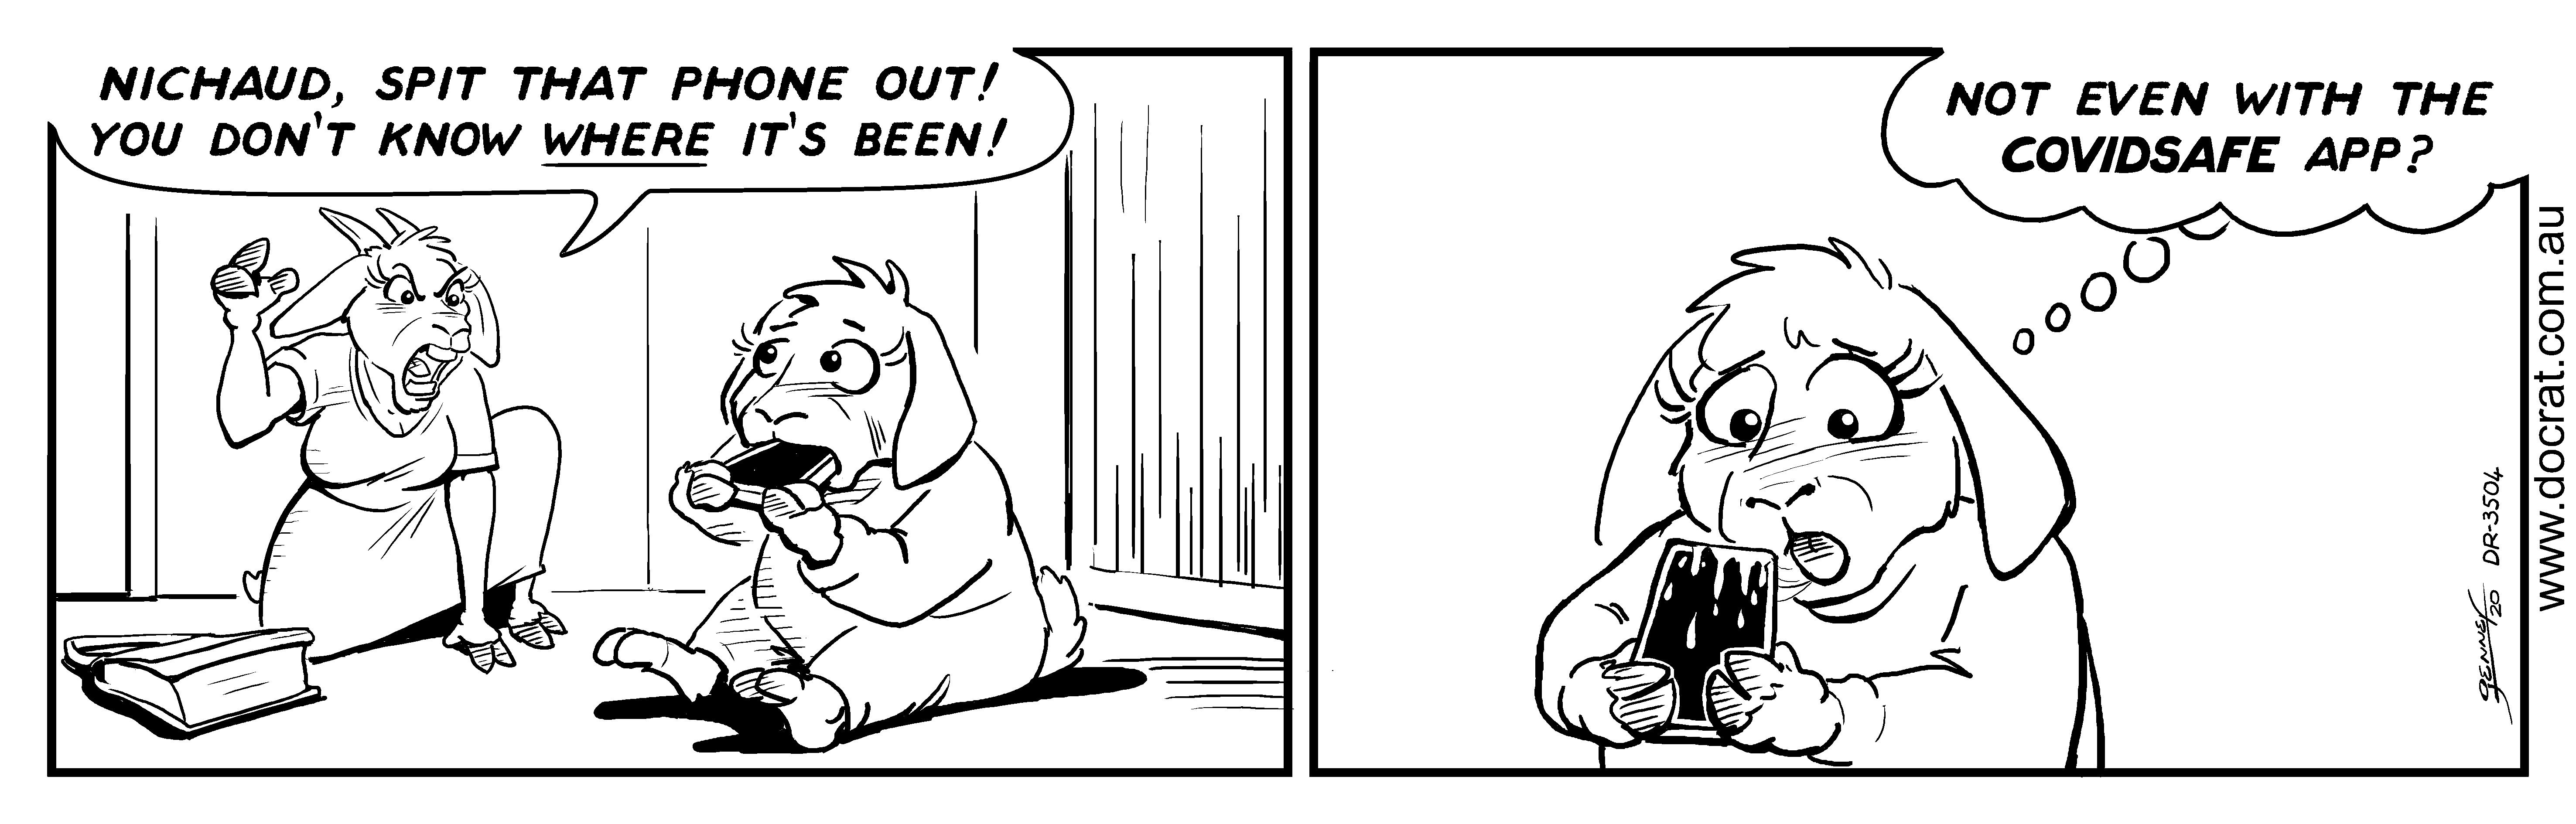 20200618